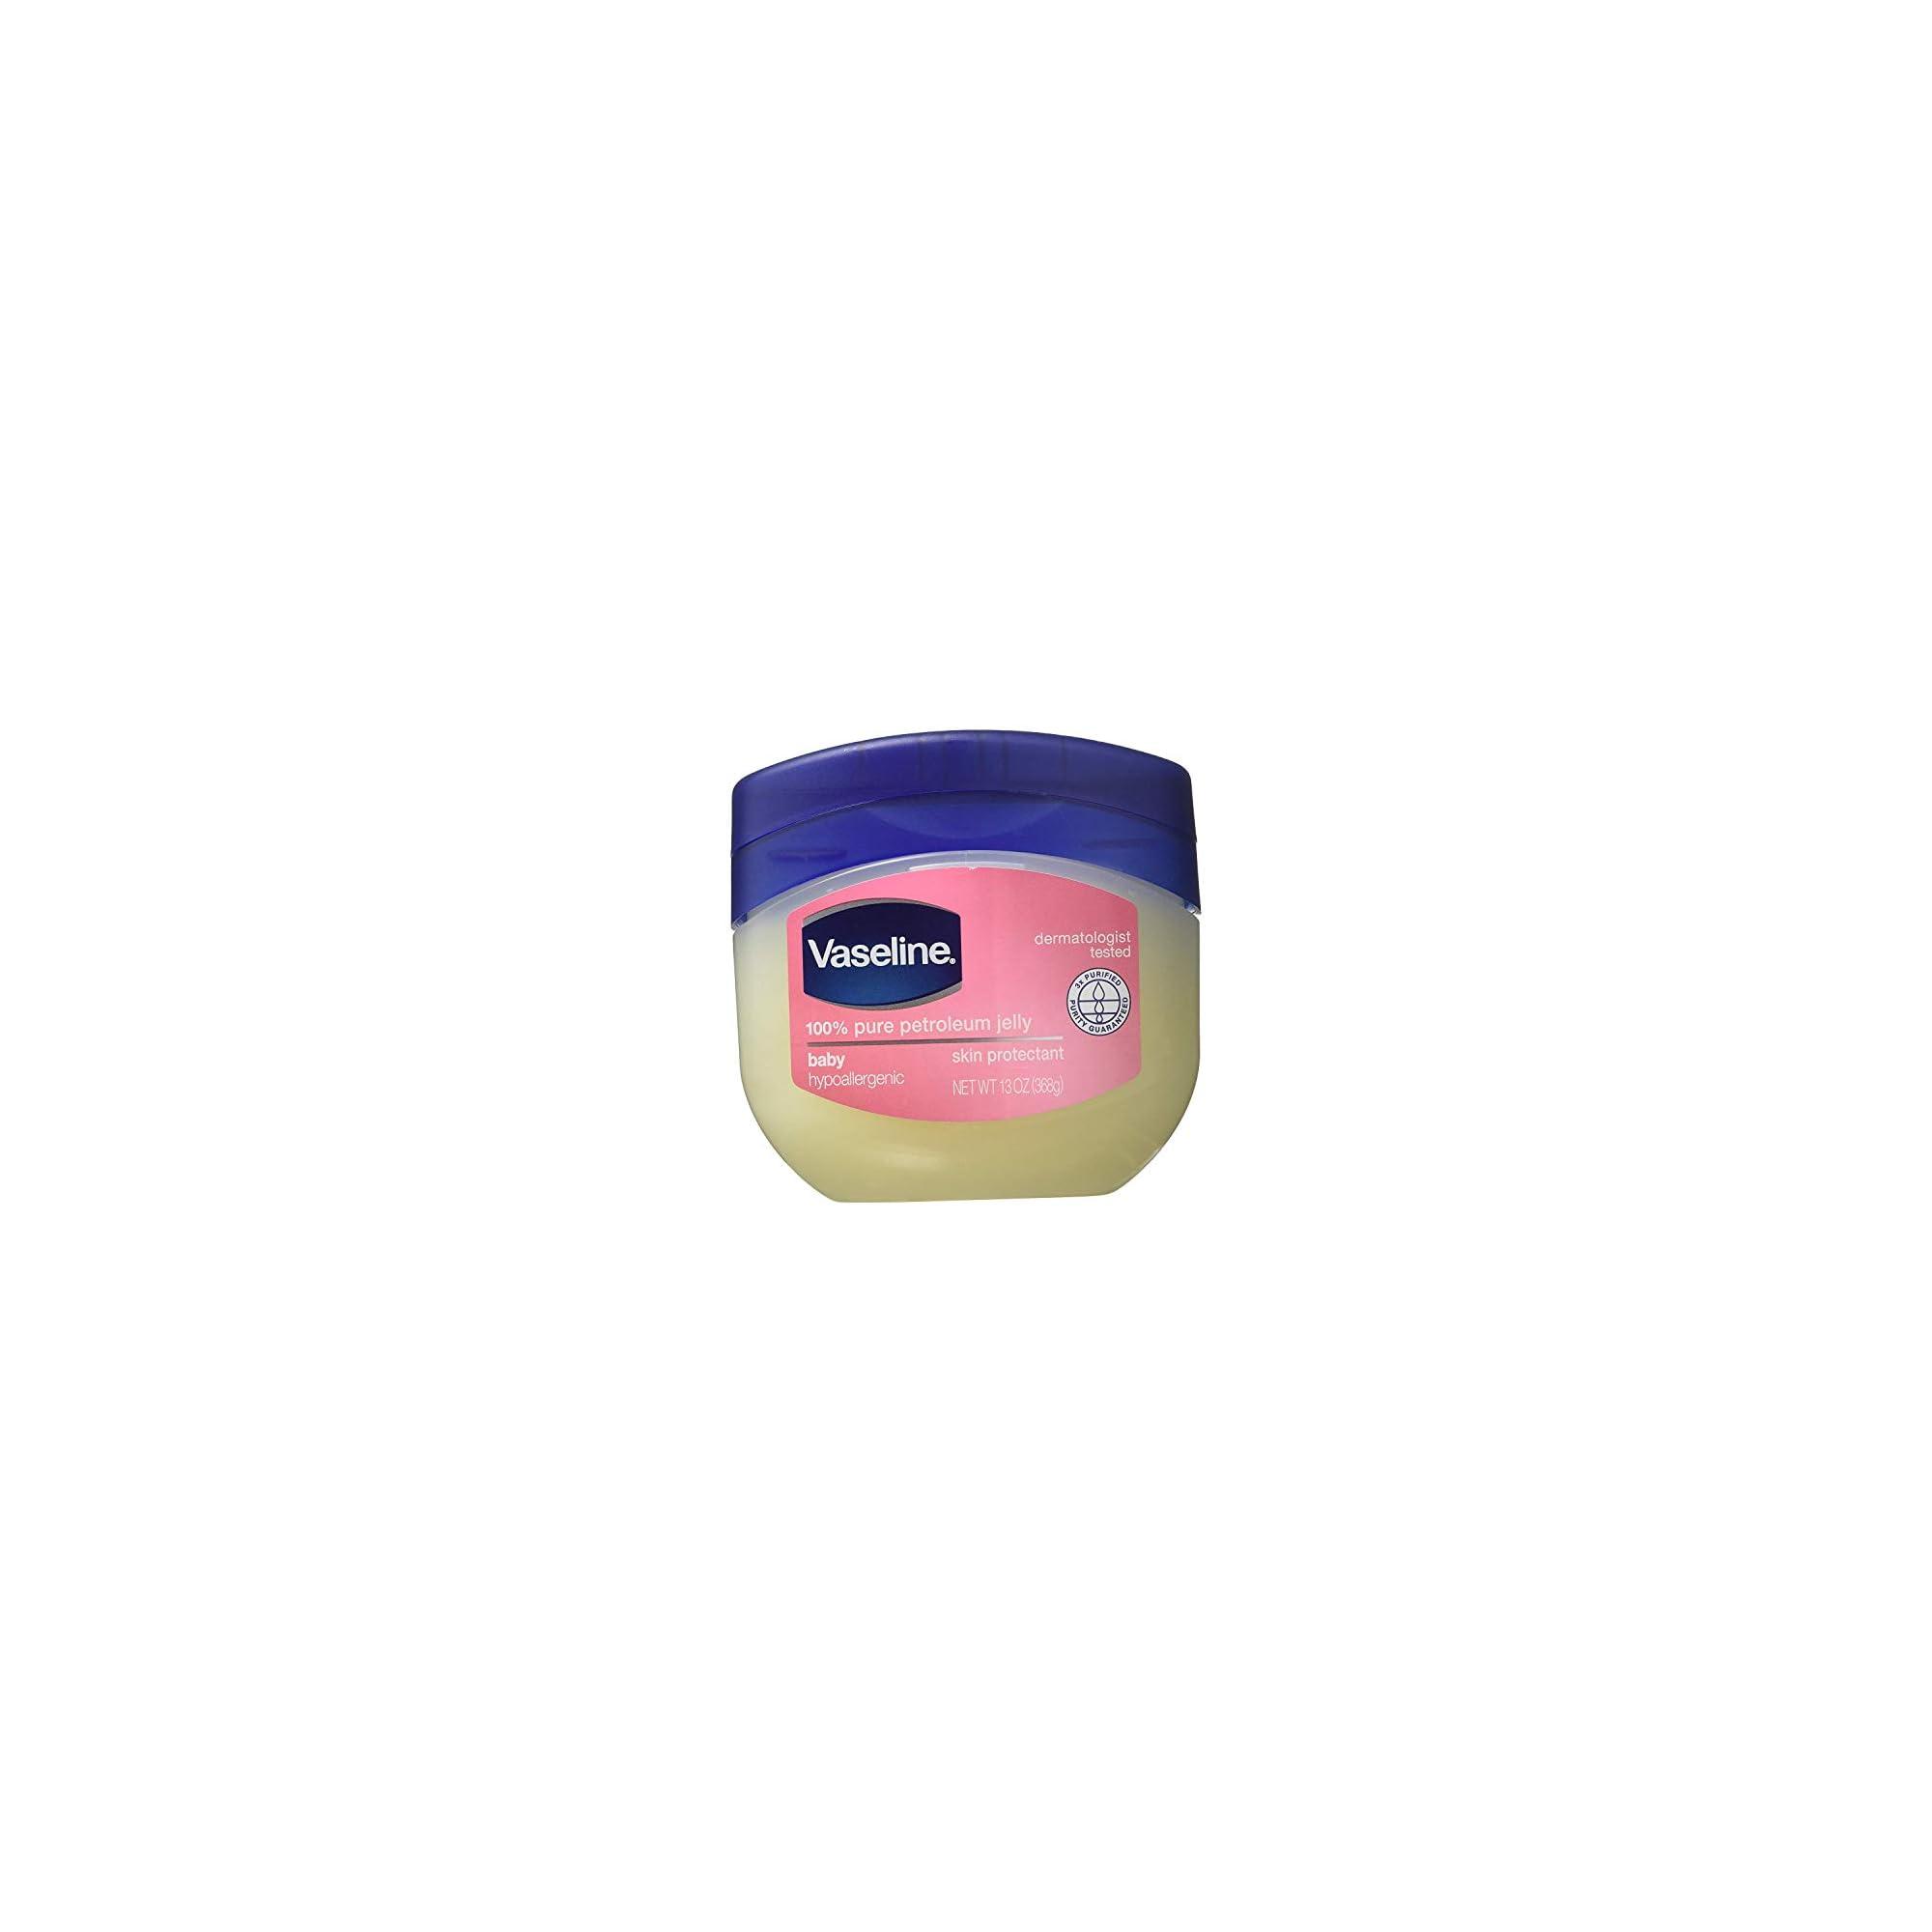 Vaseline Baby Nursery Petroleum Jelly 100% Pure, 13 Oz (Pack of 2)